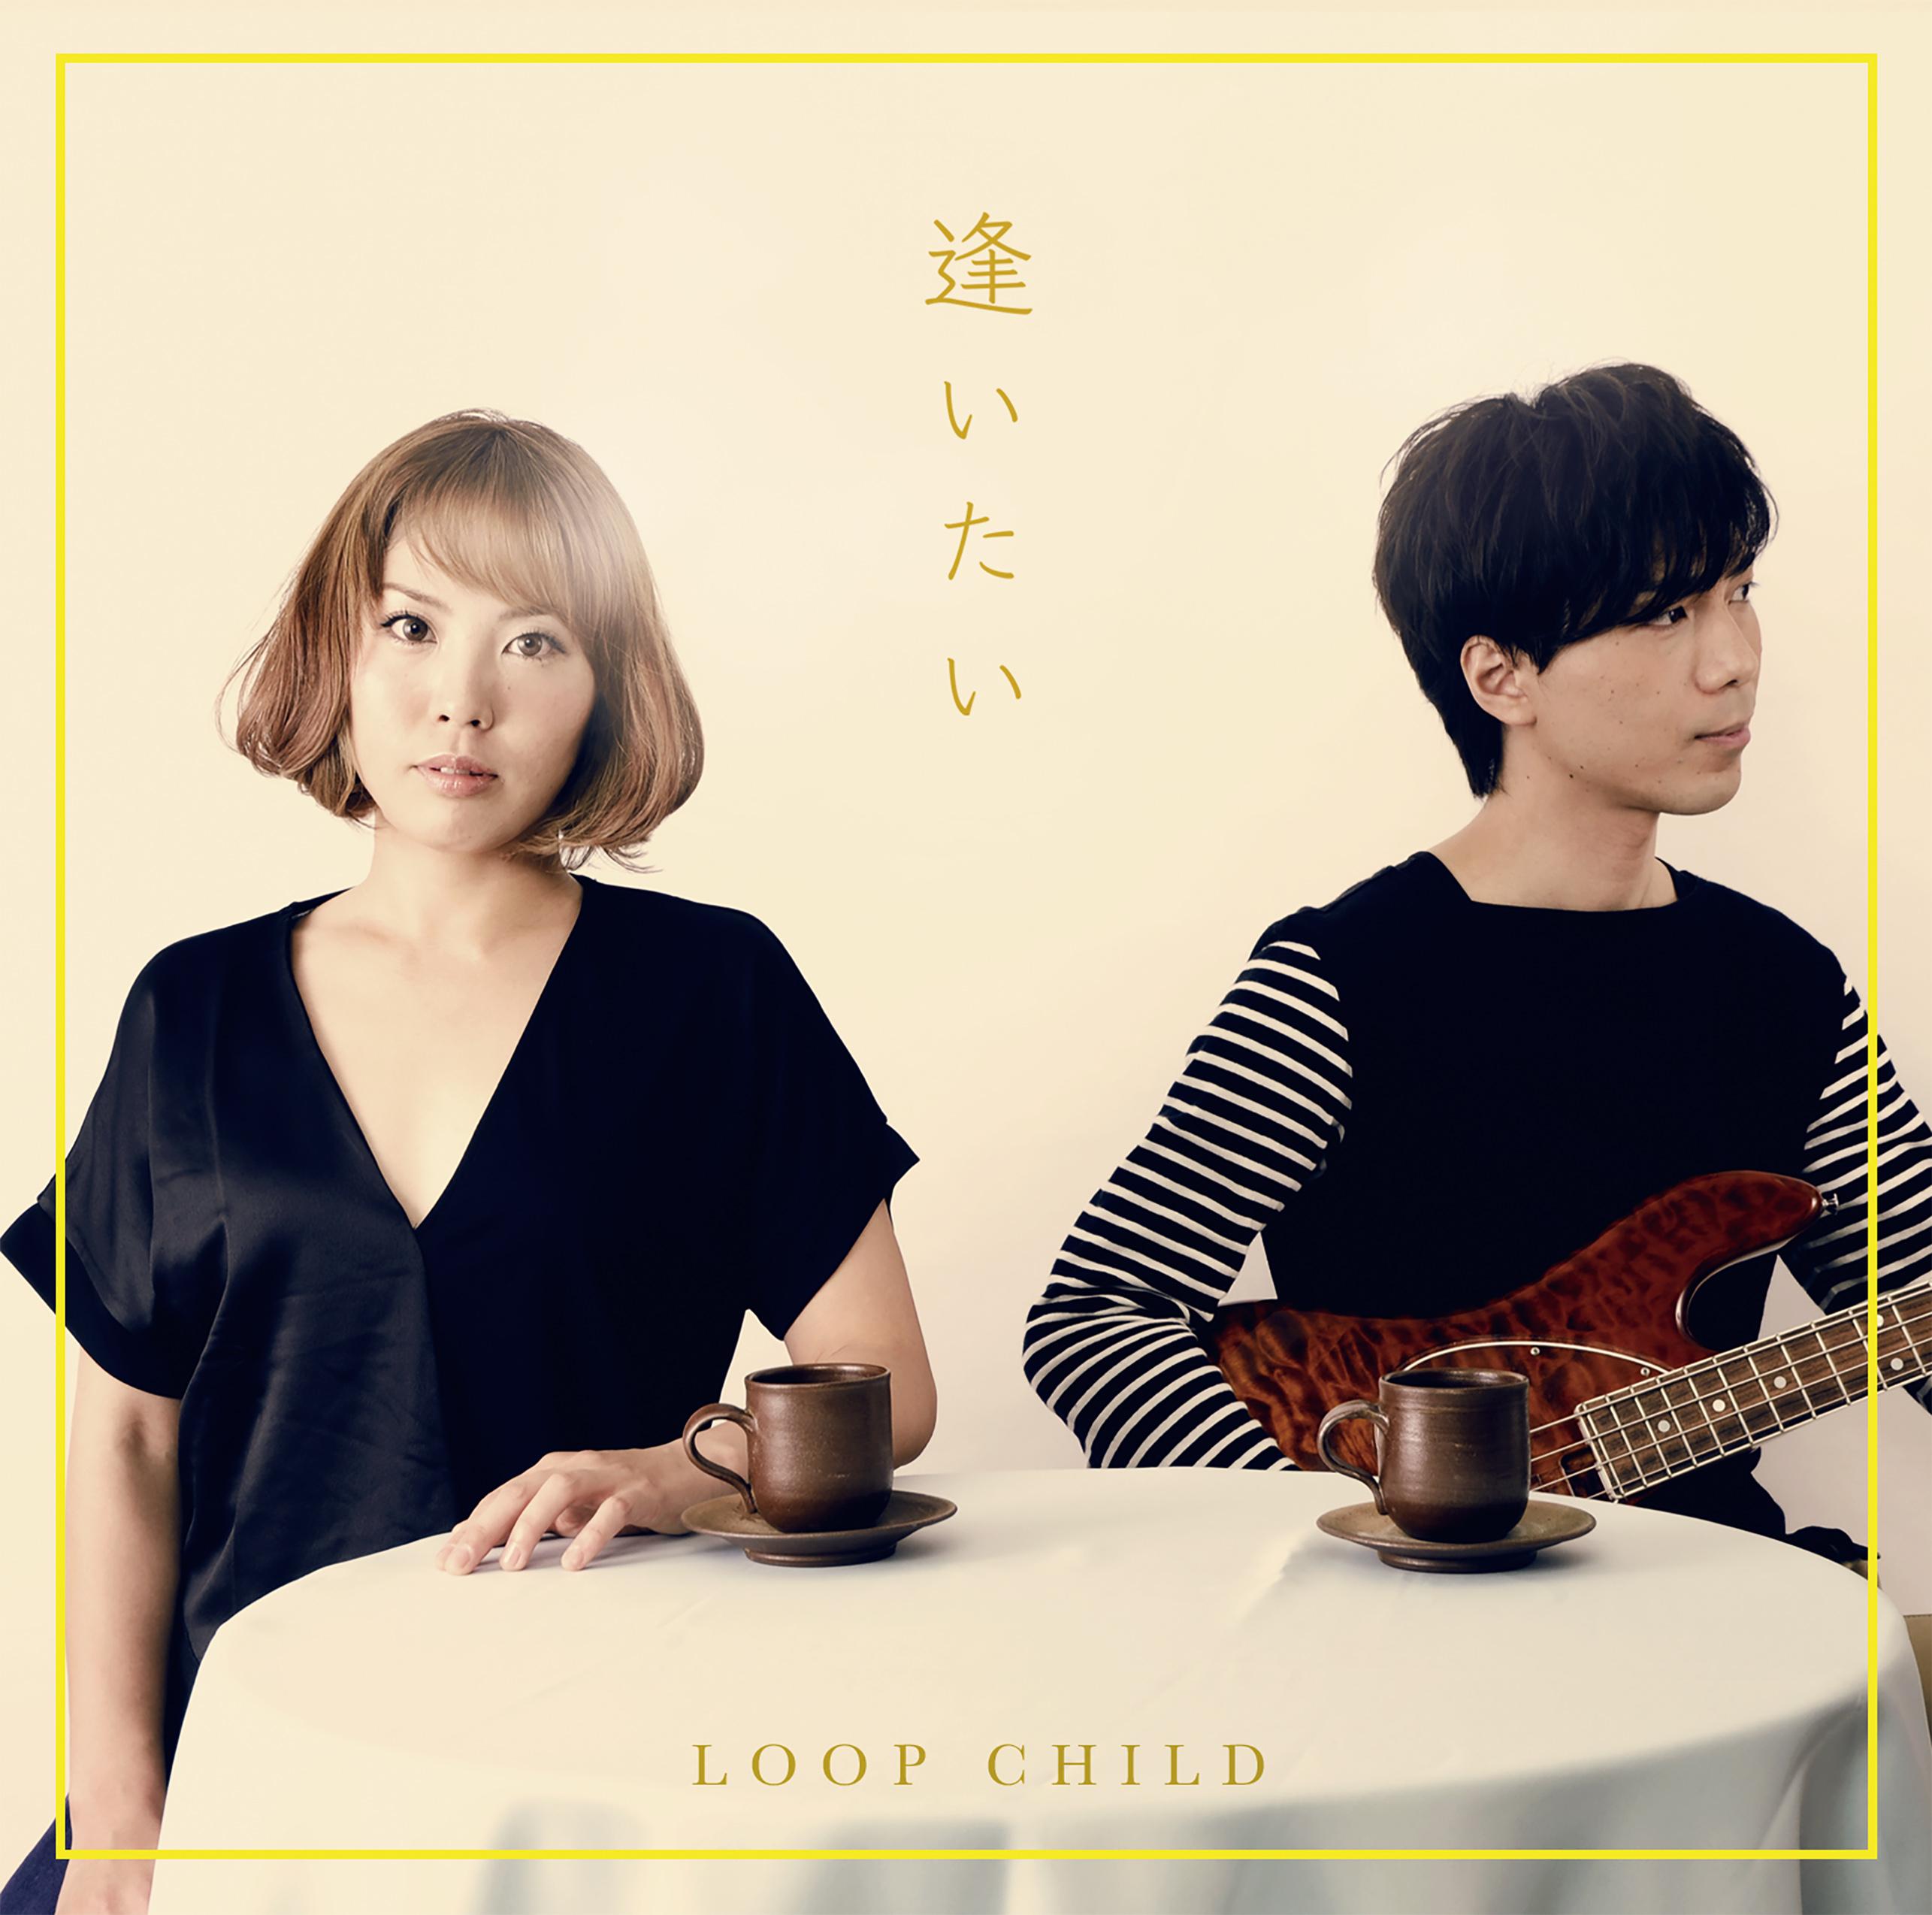 loopchild/逢いたい